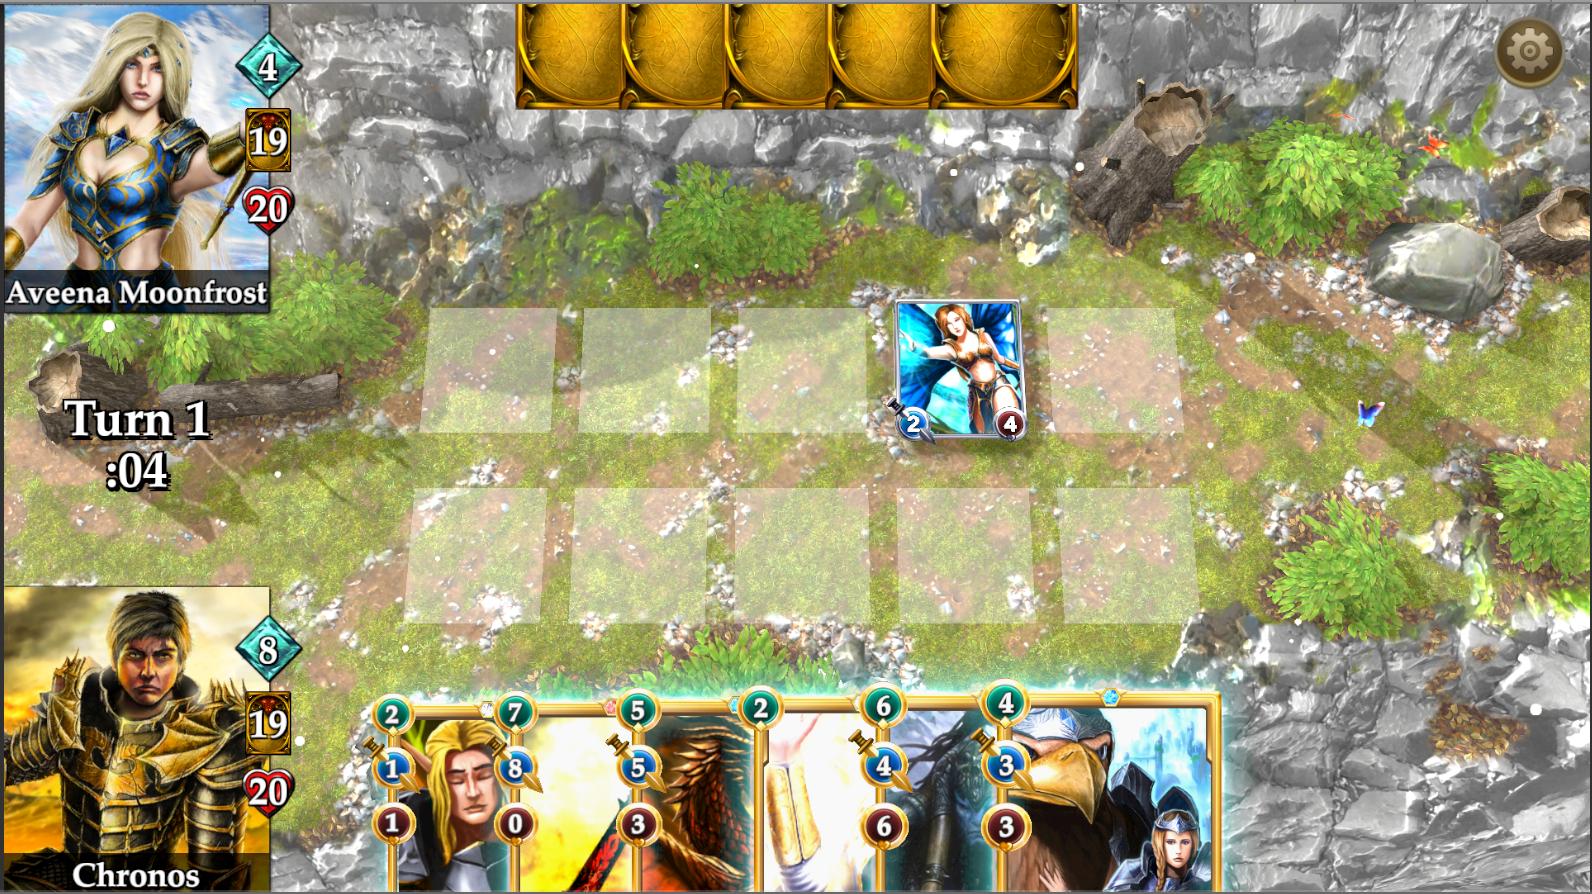 Battle Interface - 3.5 MB